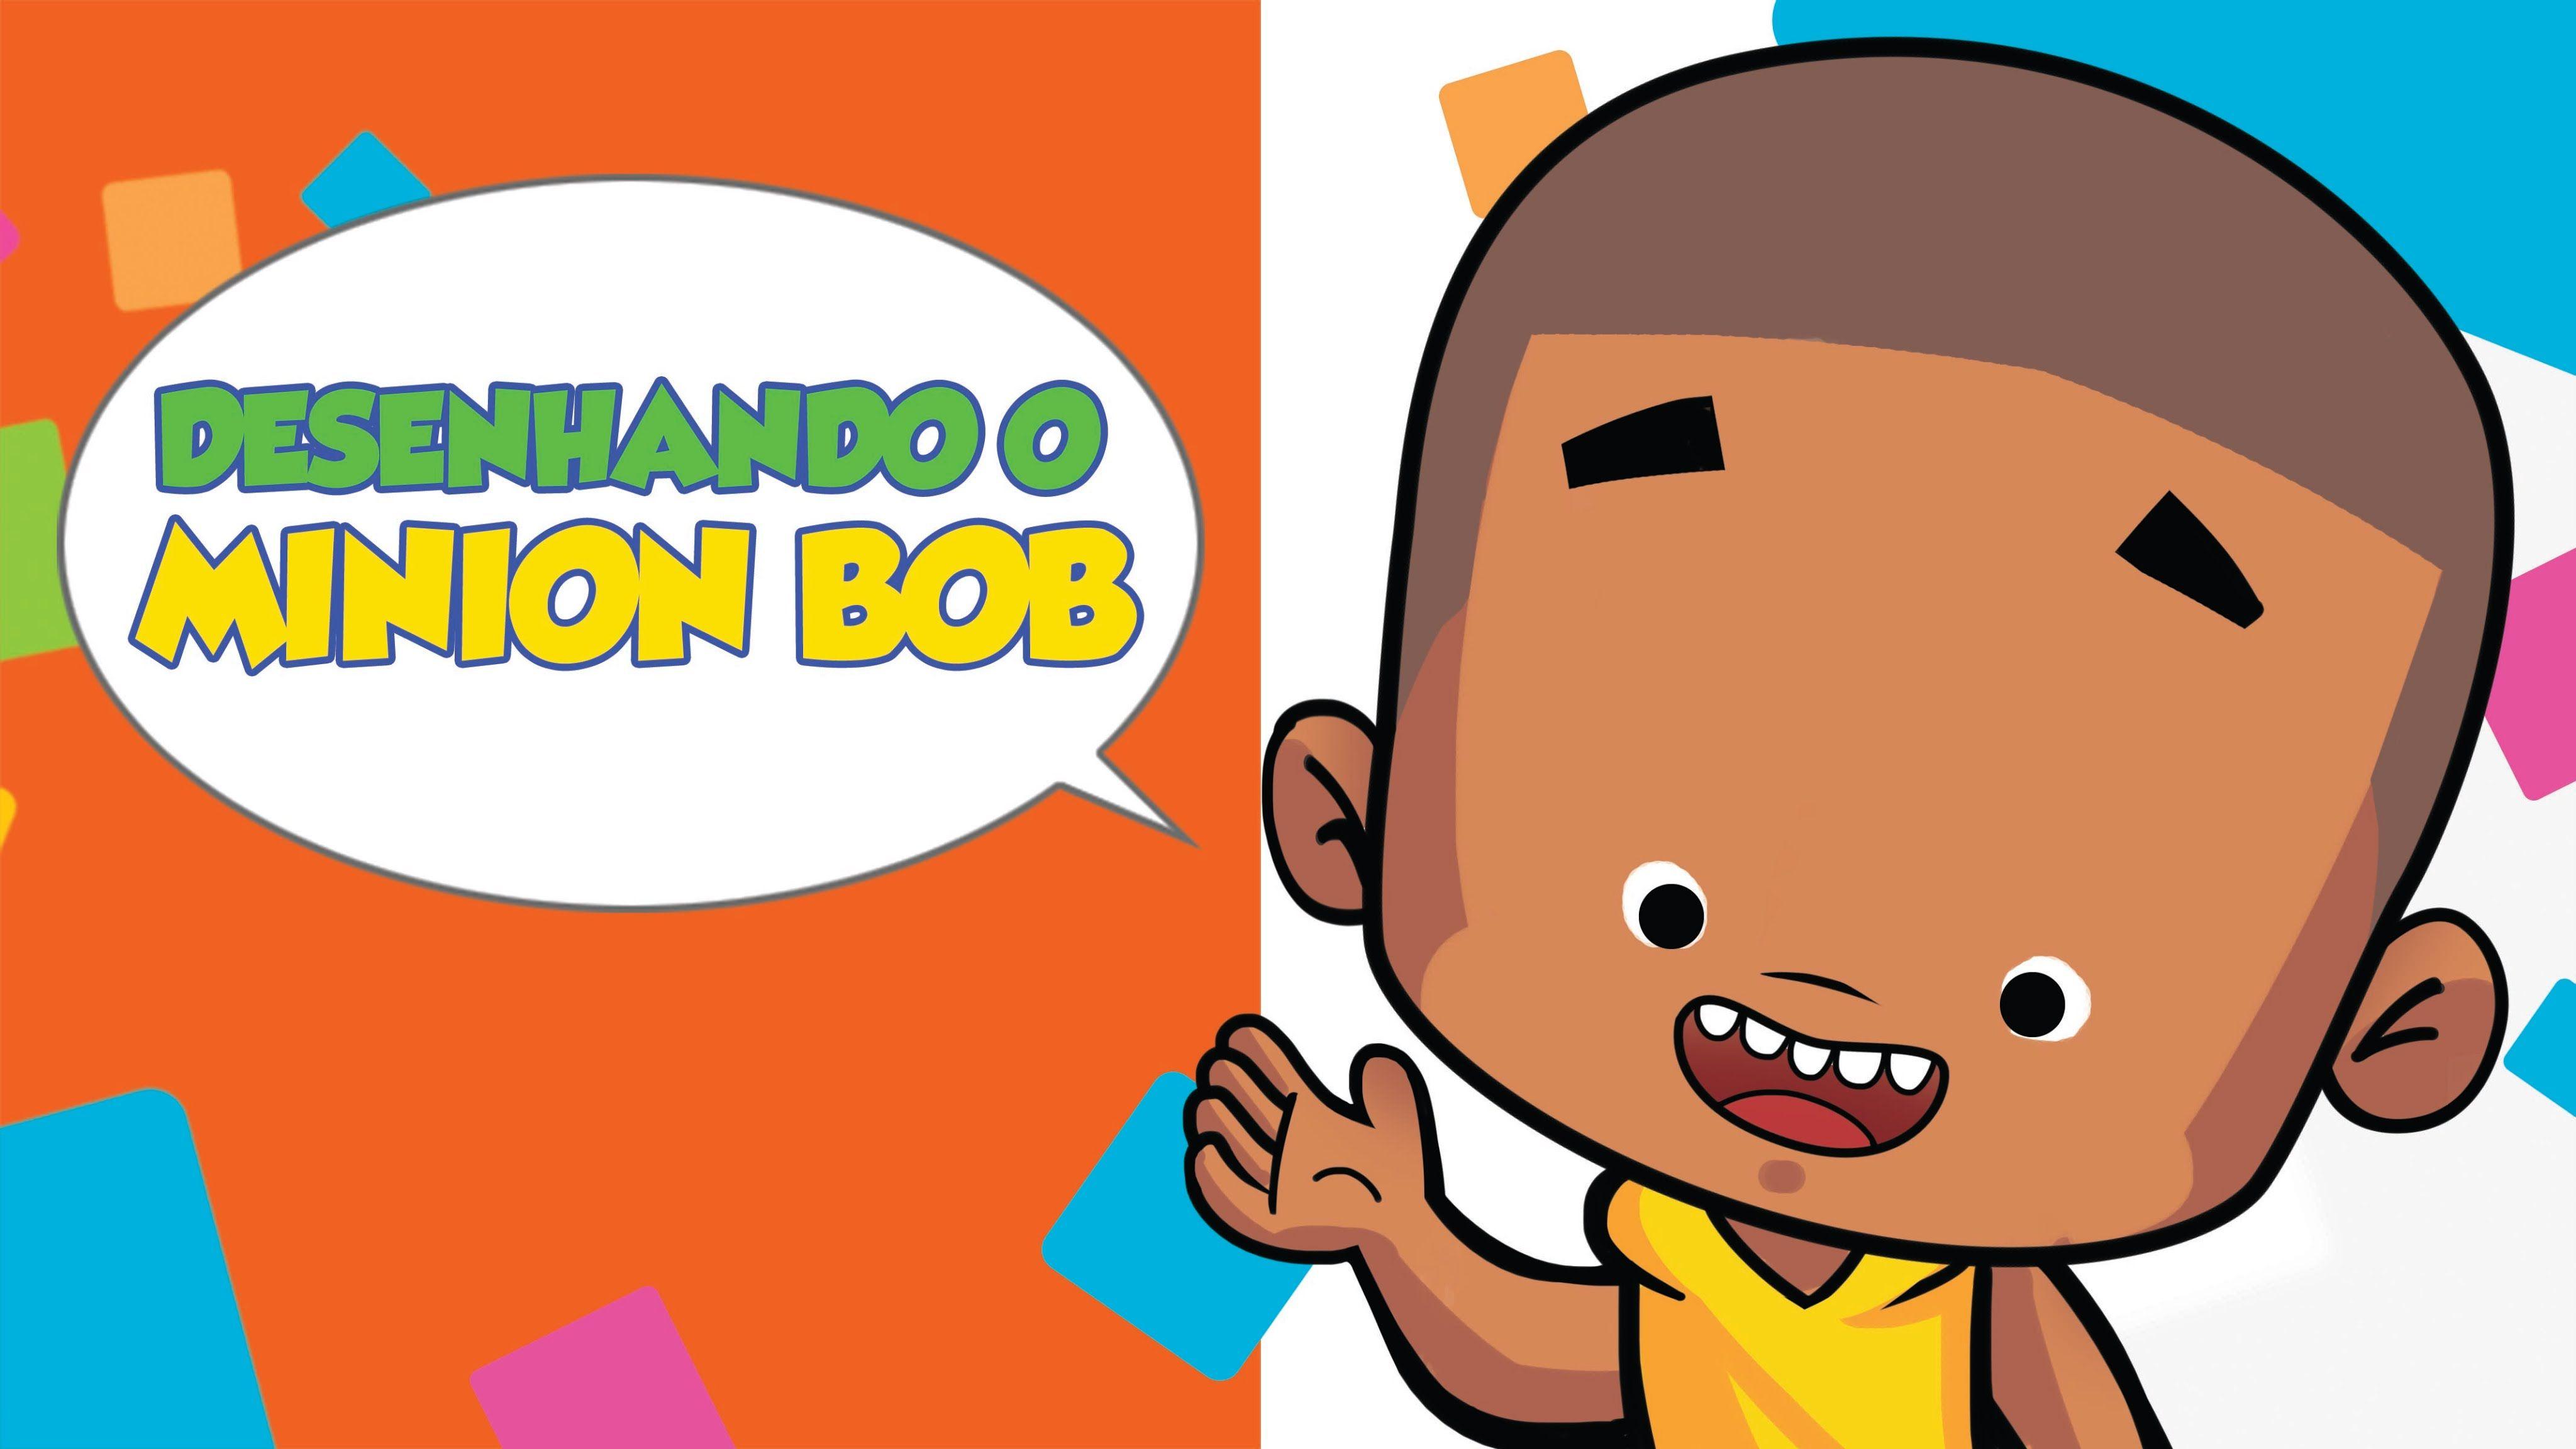 Como Desenhar Minion Bob How To Draw Minion Bob Minions Bob